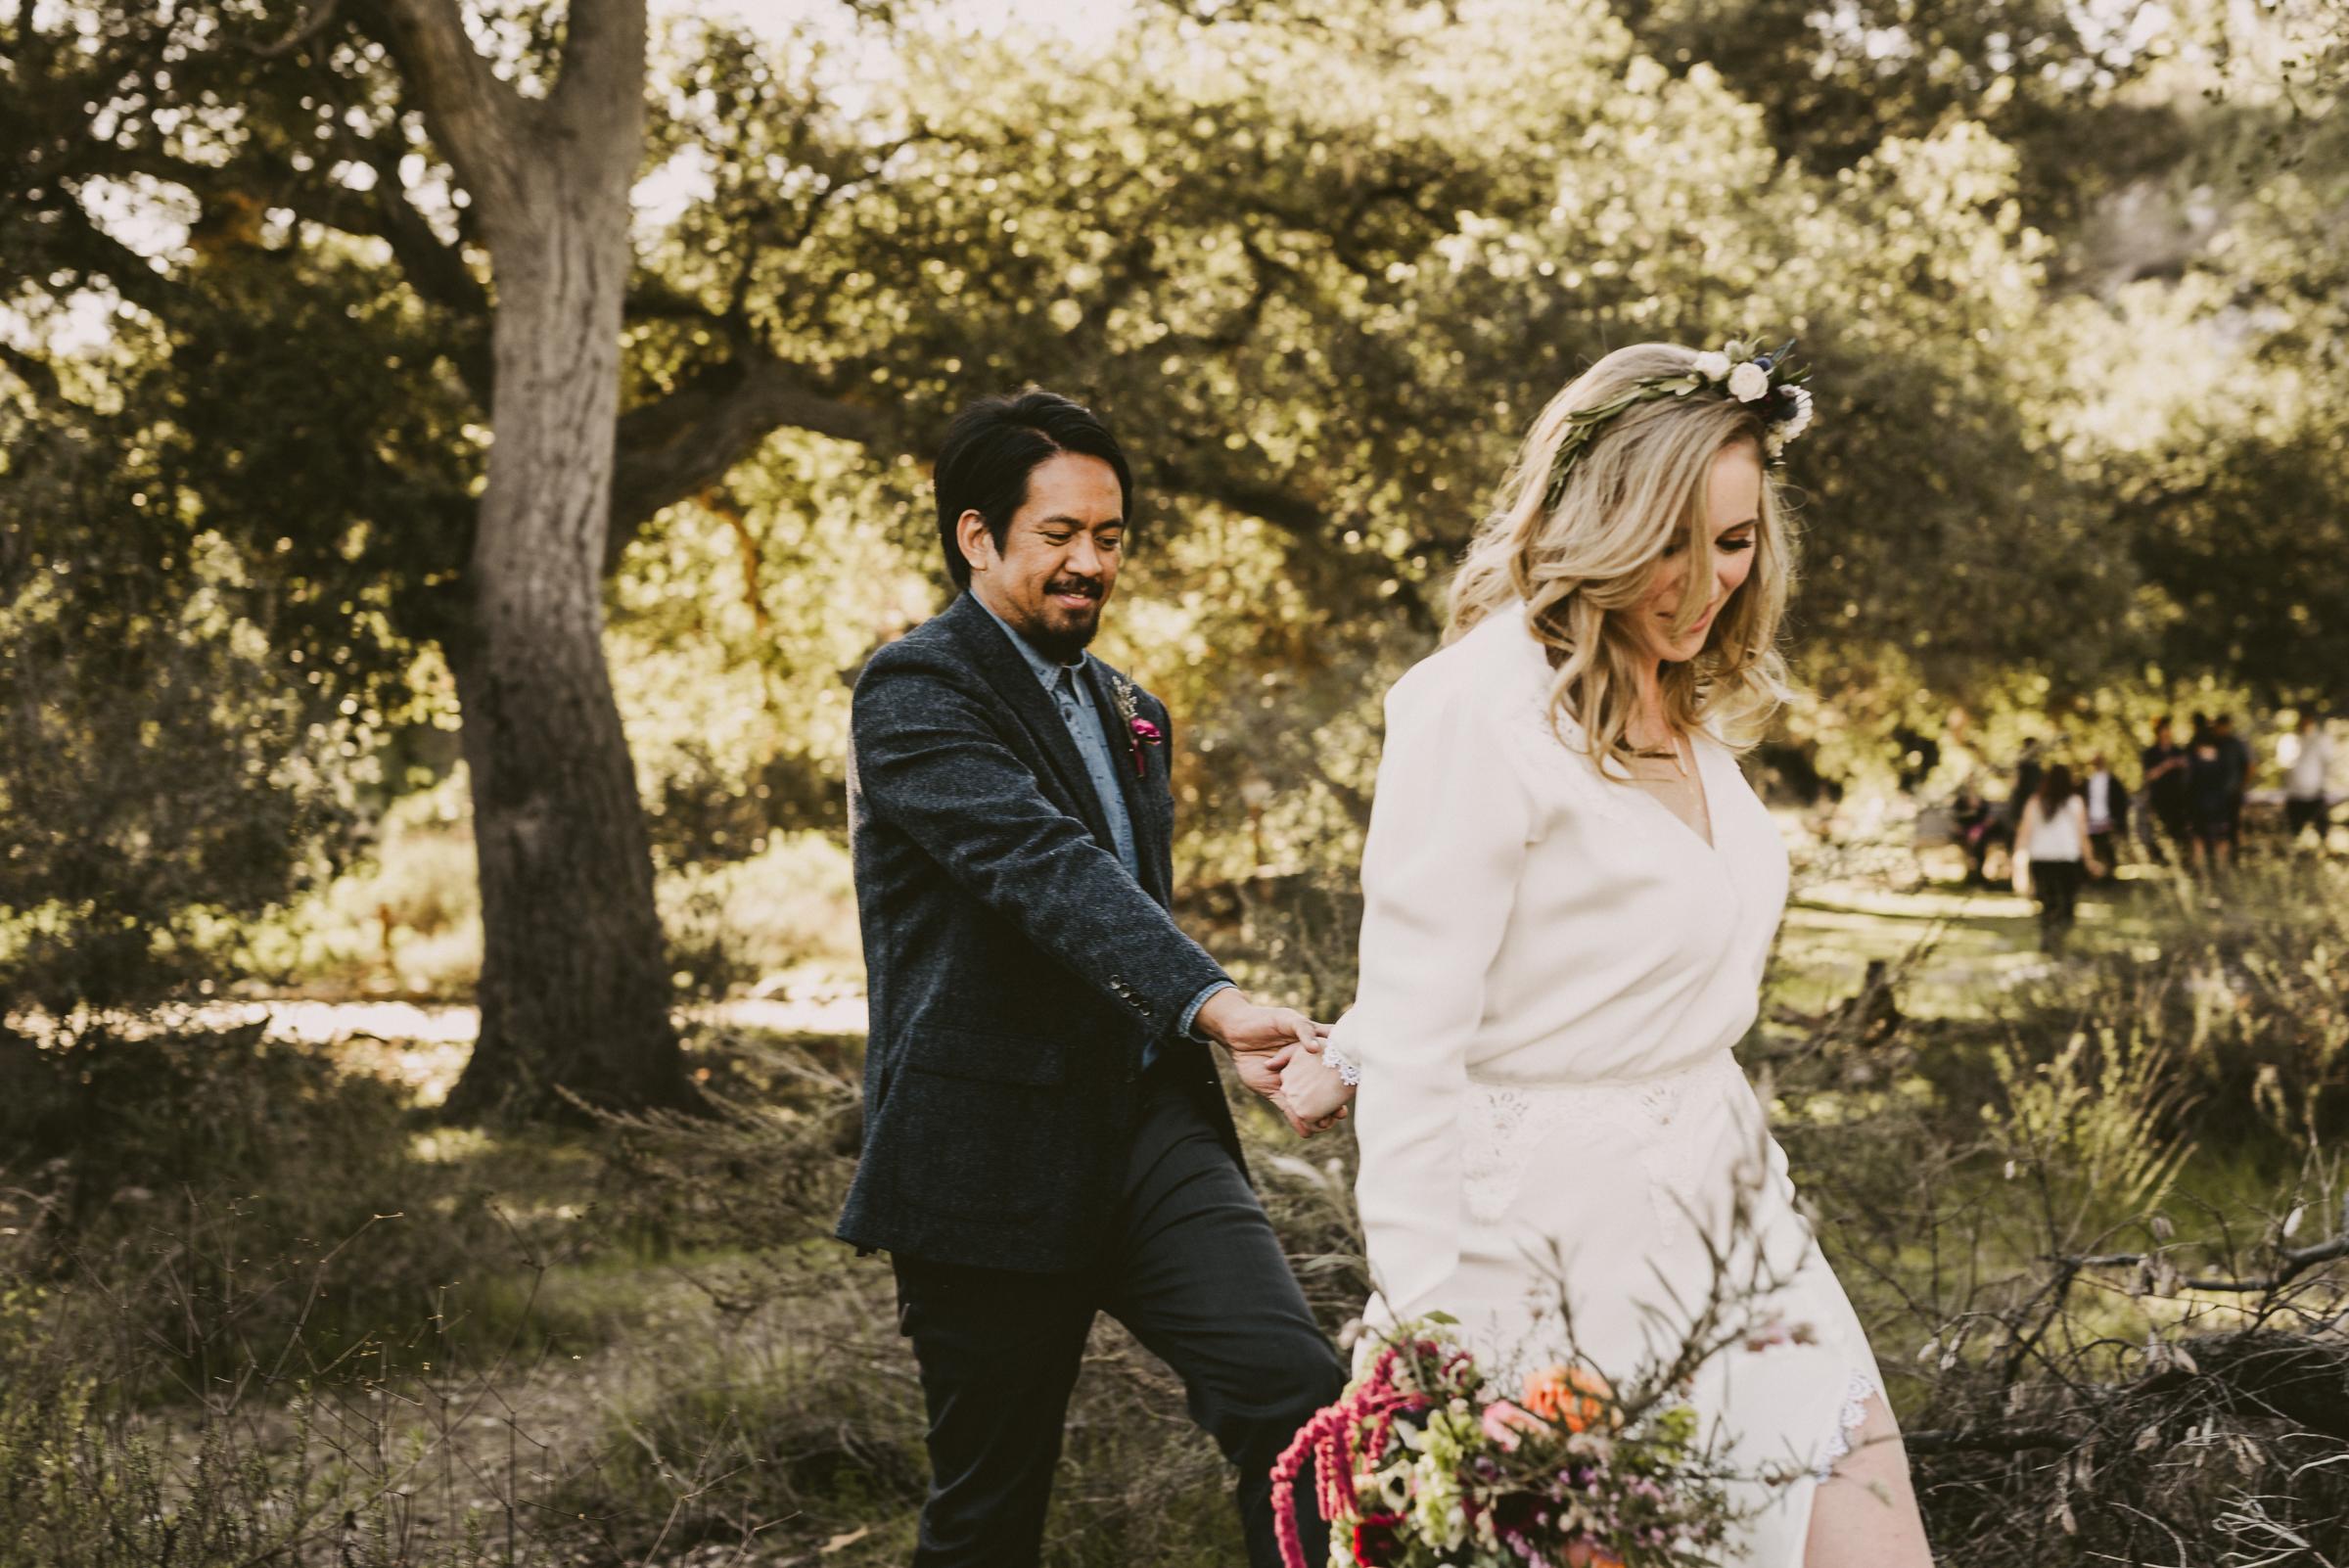 ©Isaiah + Taylor Photography - Intimate Elopement, Eaton Canyon, Los Angeles Wedding Photographer-53.jpg